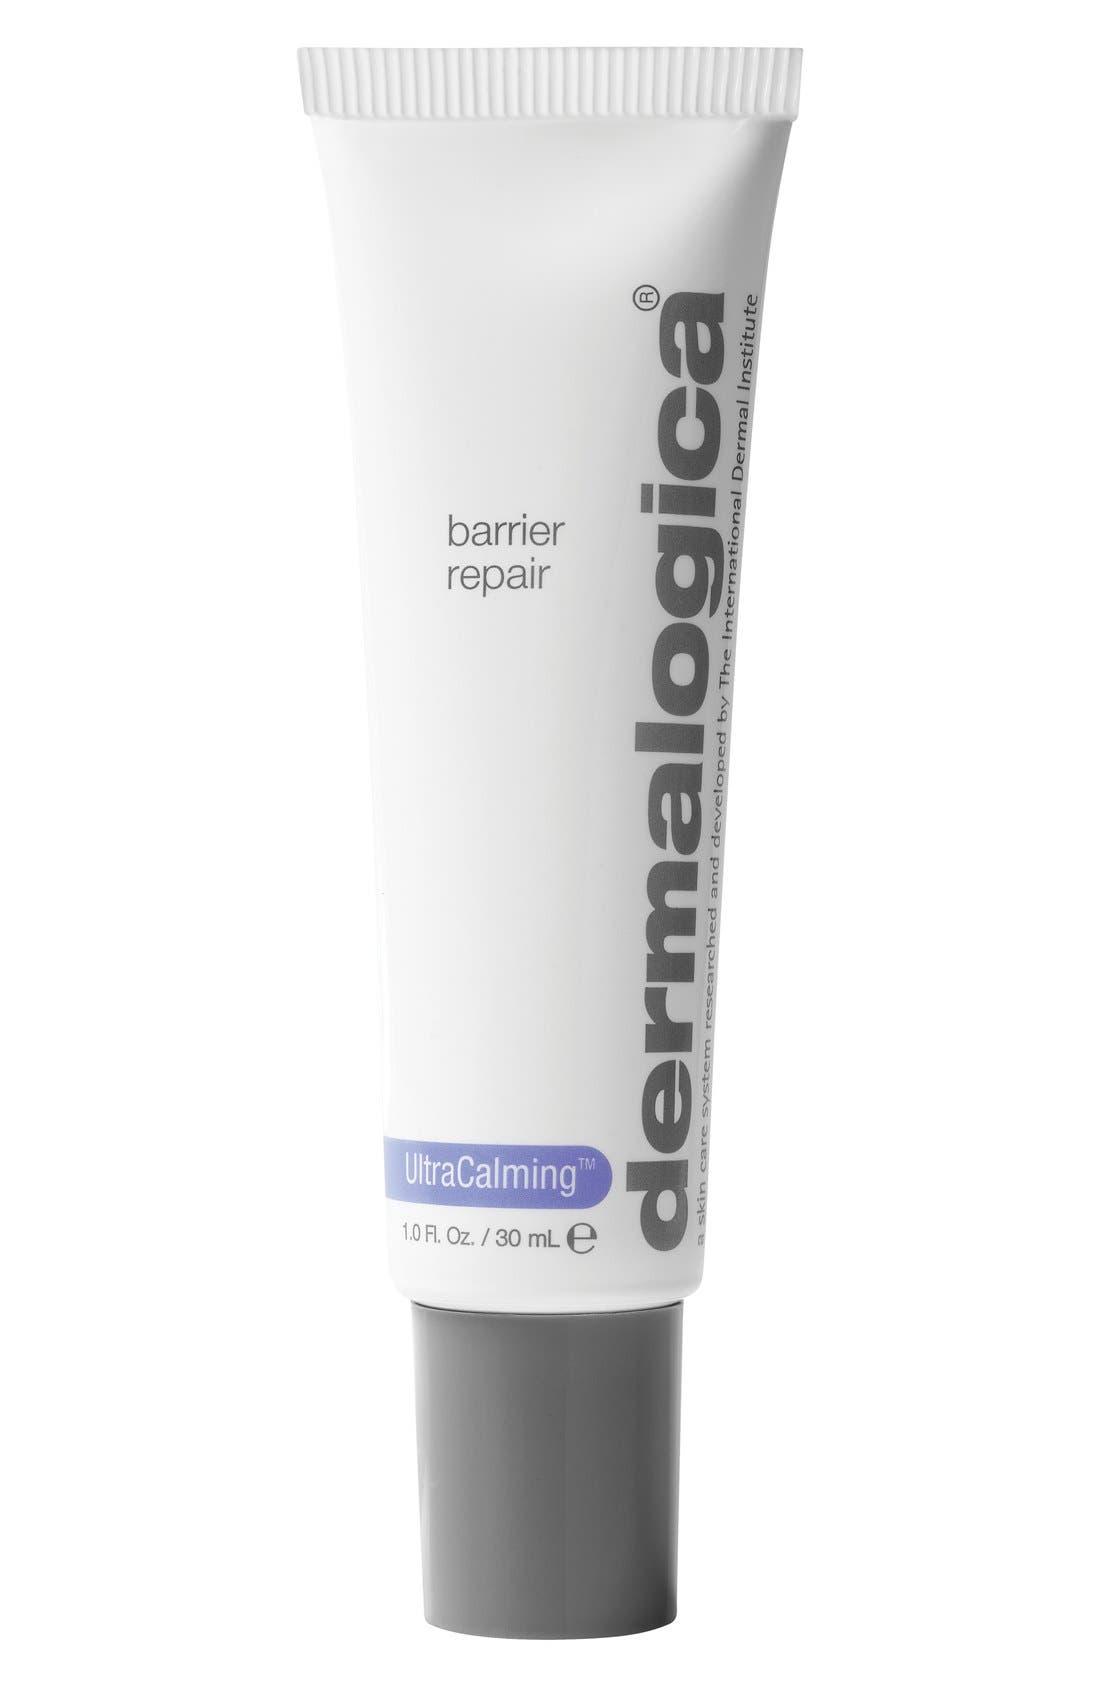 dermalogica® Barrier Repair